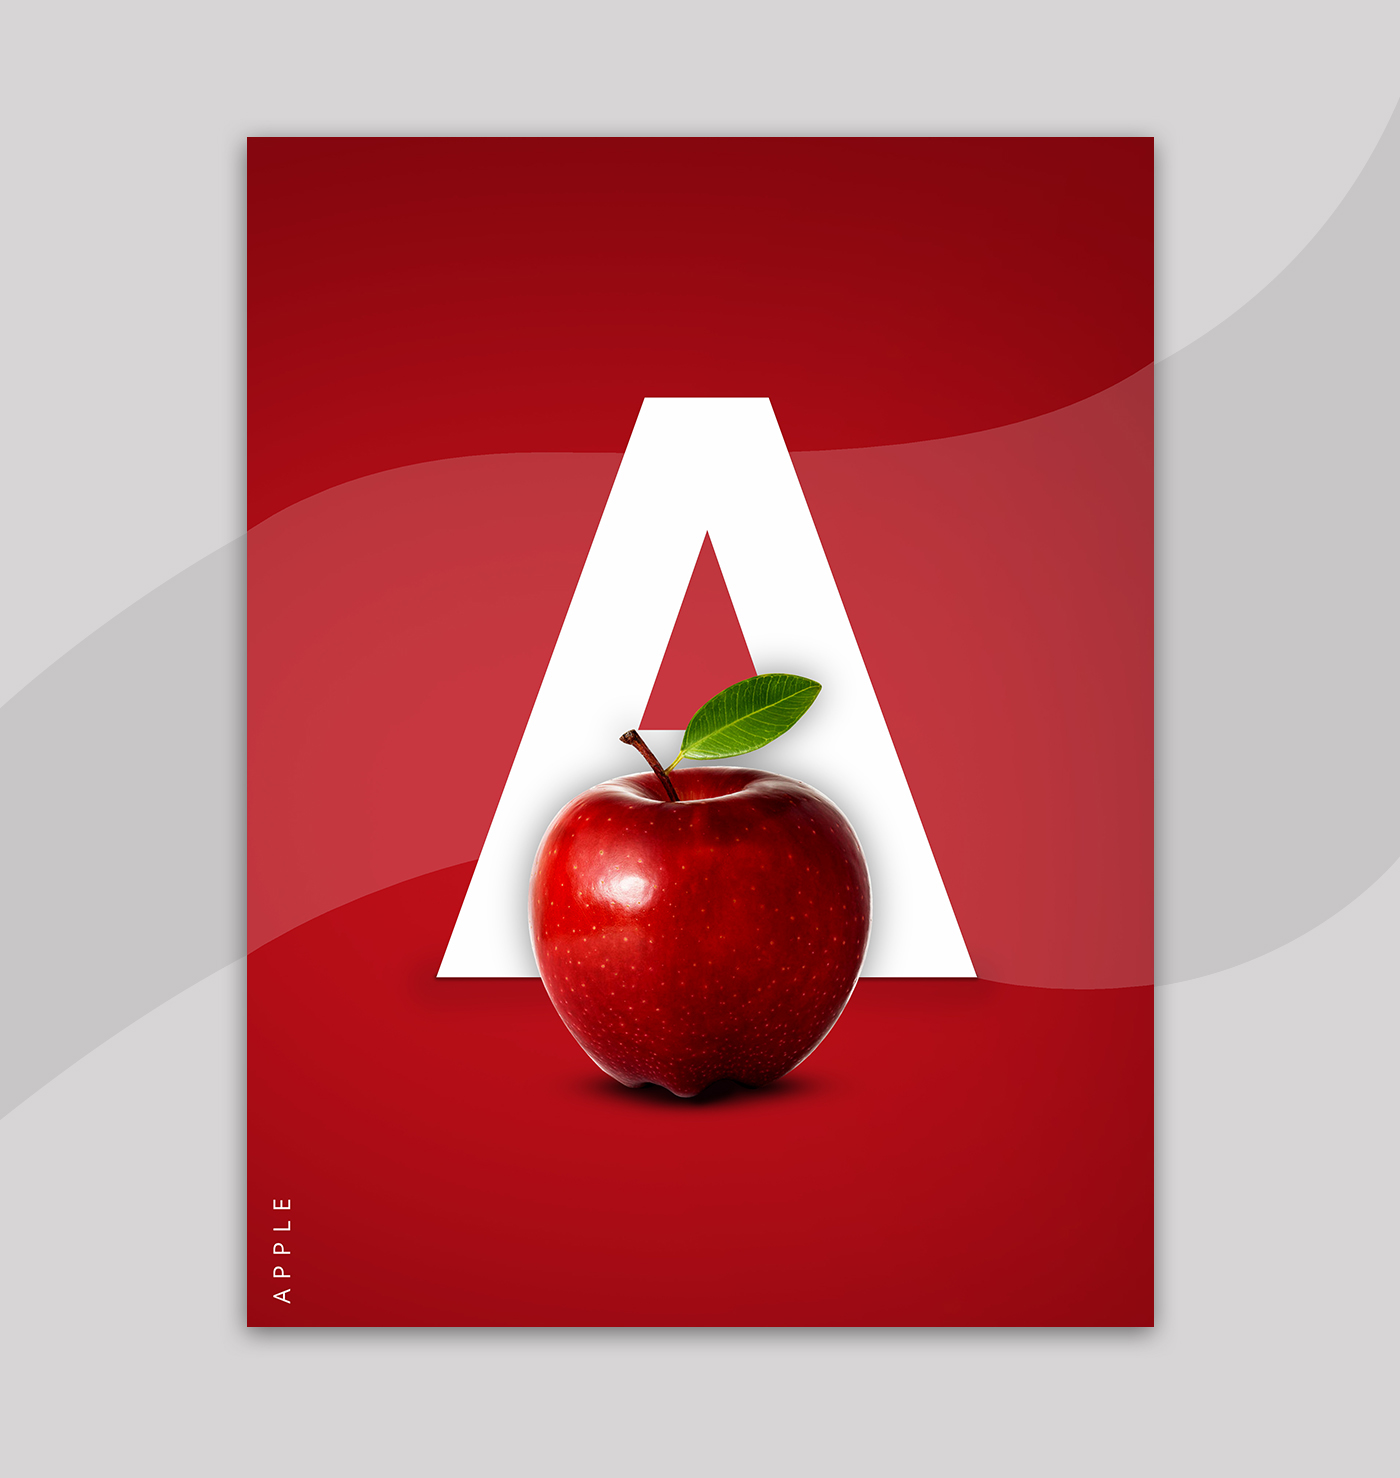 D d poster design - D D Poster Design 44